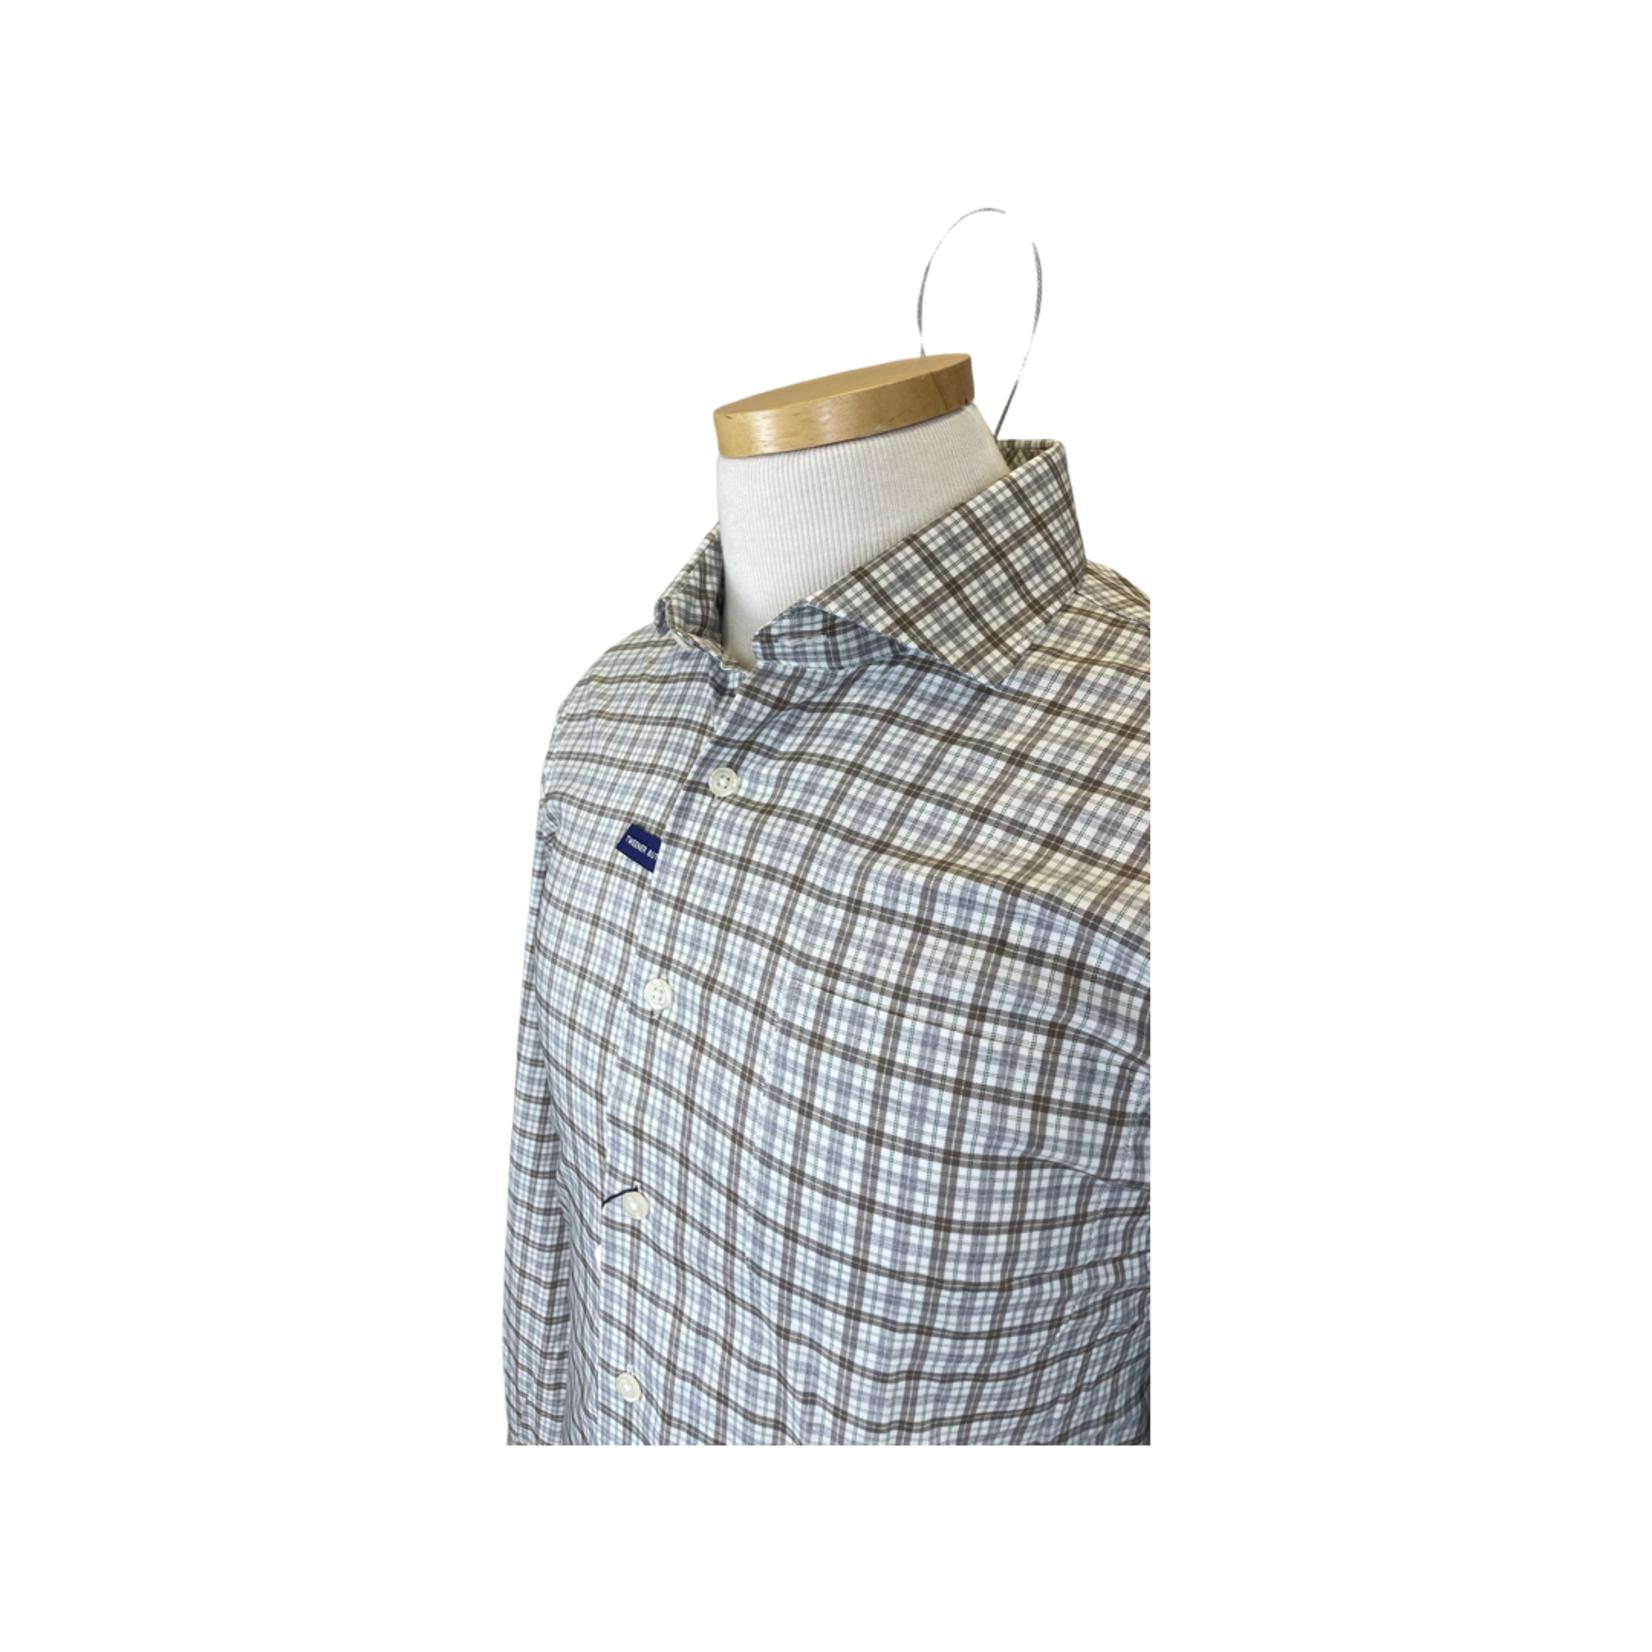 Johnnie-O johnnie-O Sport Shirt